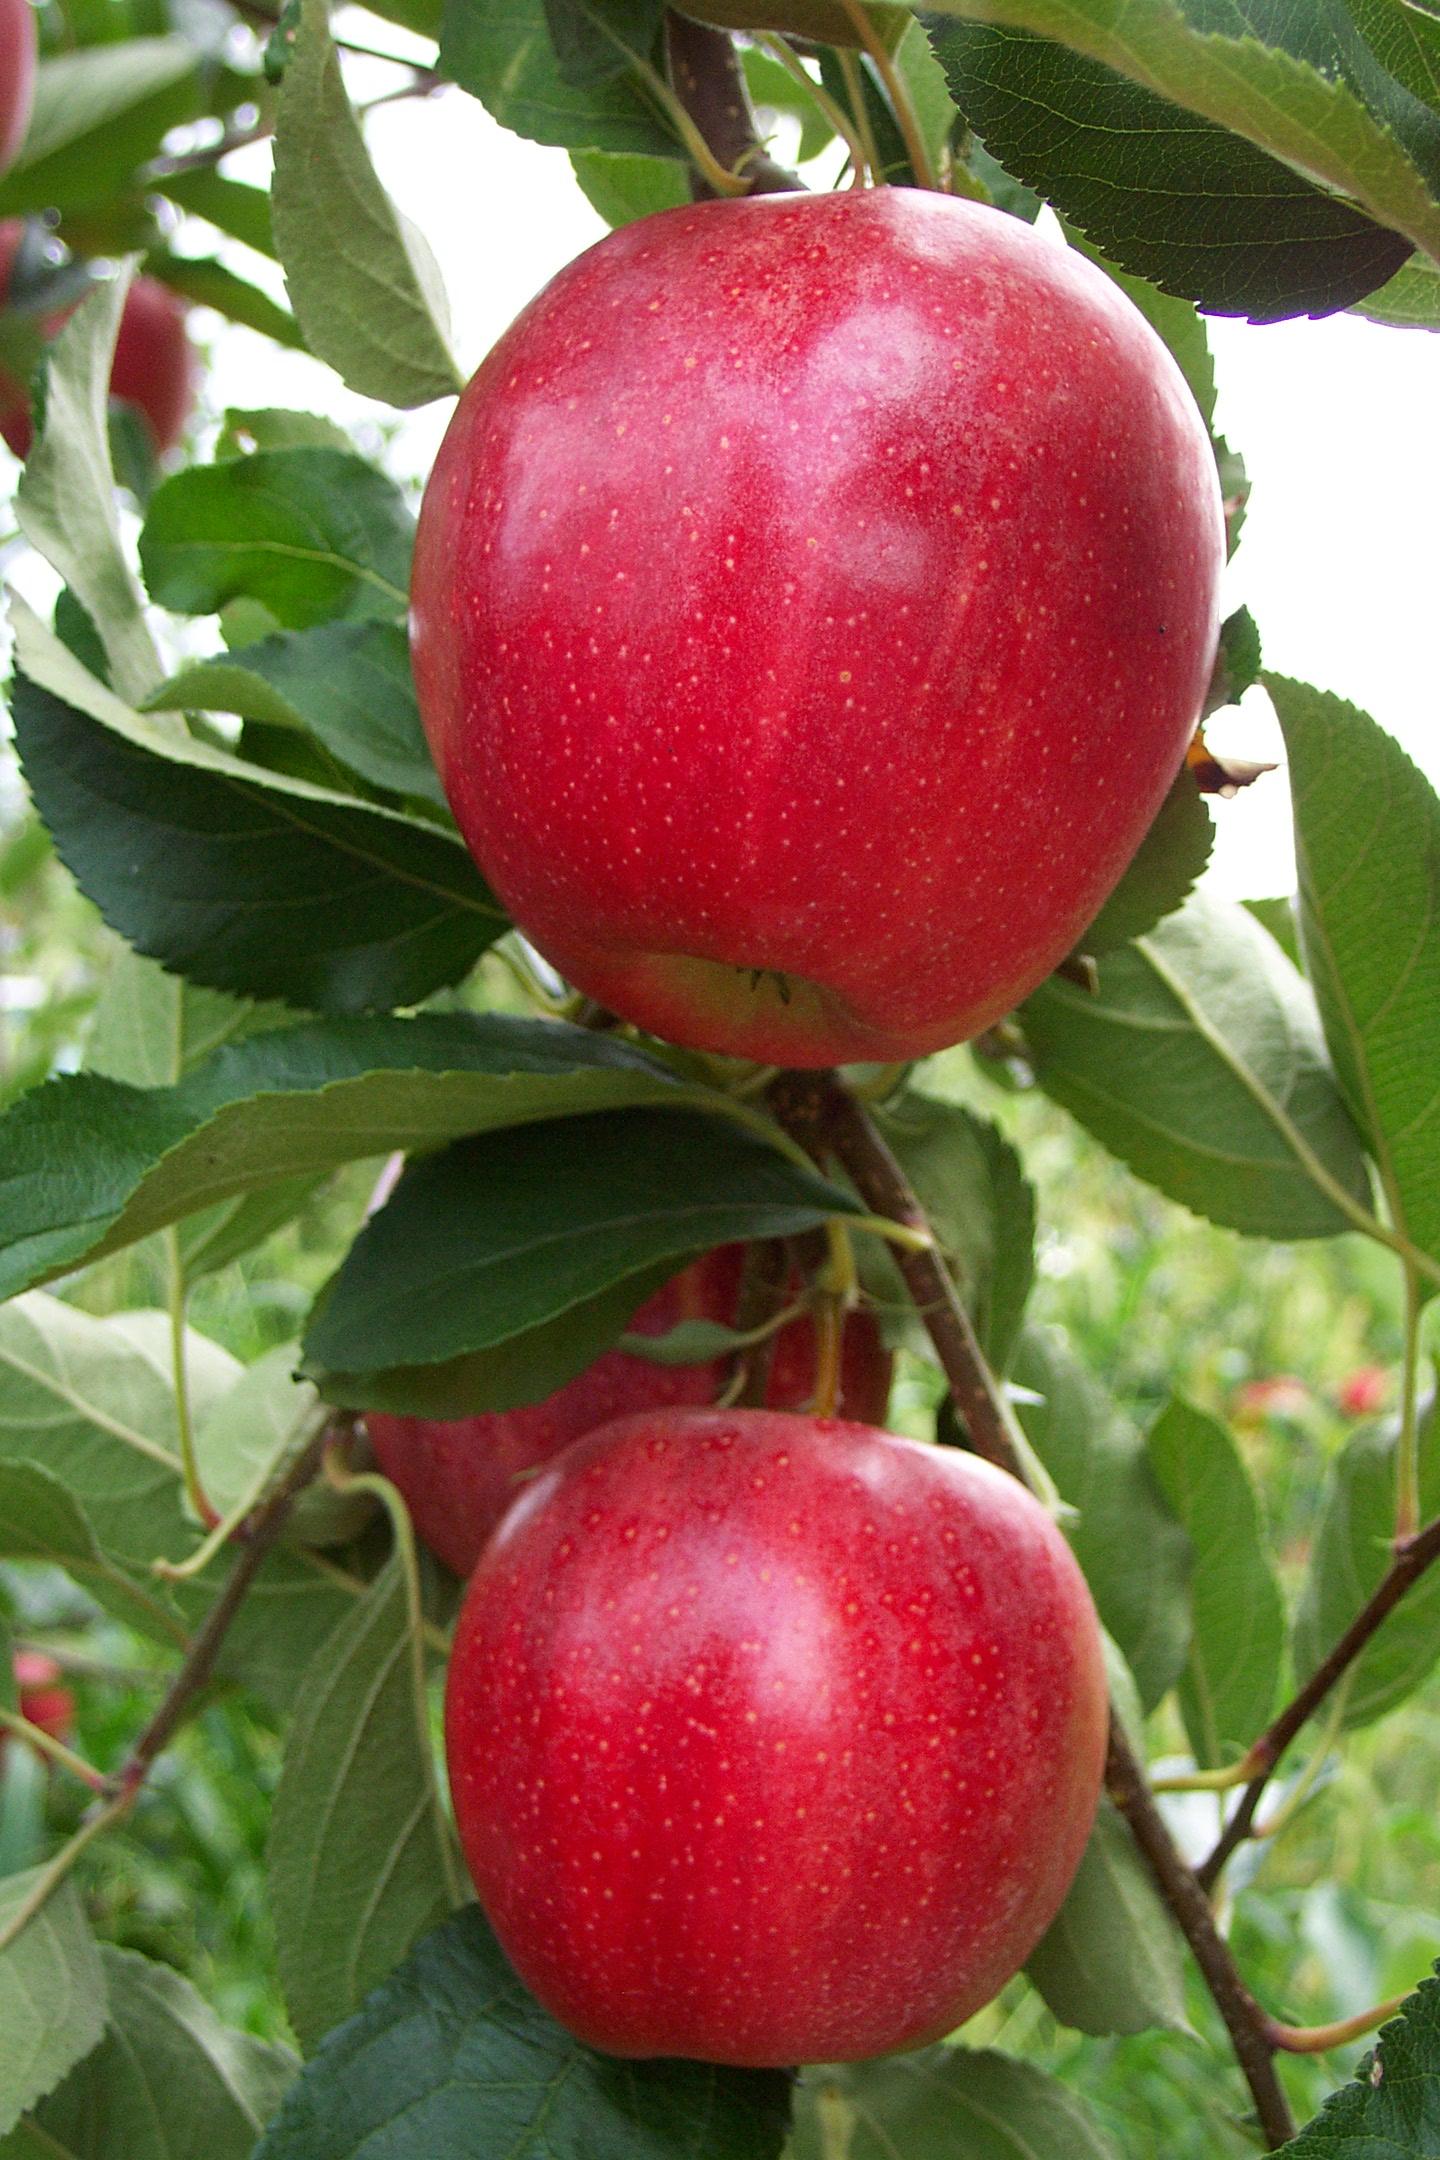 Hrf Apple Varieties Watermelon Wallpaper Rainbow Find Free HD for Desktop [freshlhys.tk]